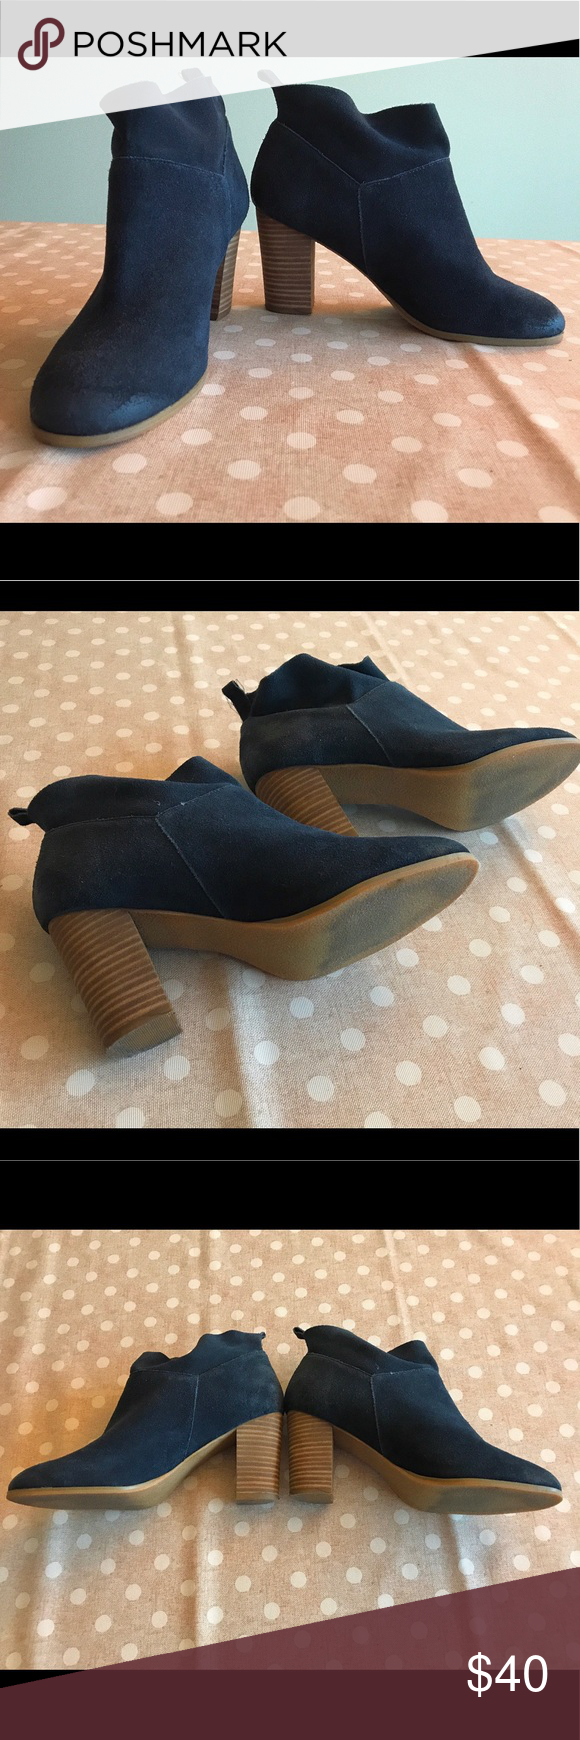 Dsw Women Suede Ankle Boots Dark Blue Women 6 5 Women Size 6 5 Dark Blue Heel Height 8 5cm Purchased From Dsw Only Worn Boots Suede Ankle Boots Dsw Shoes